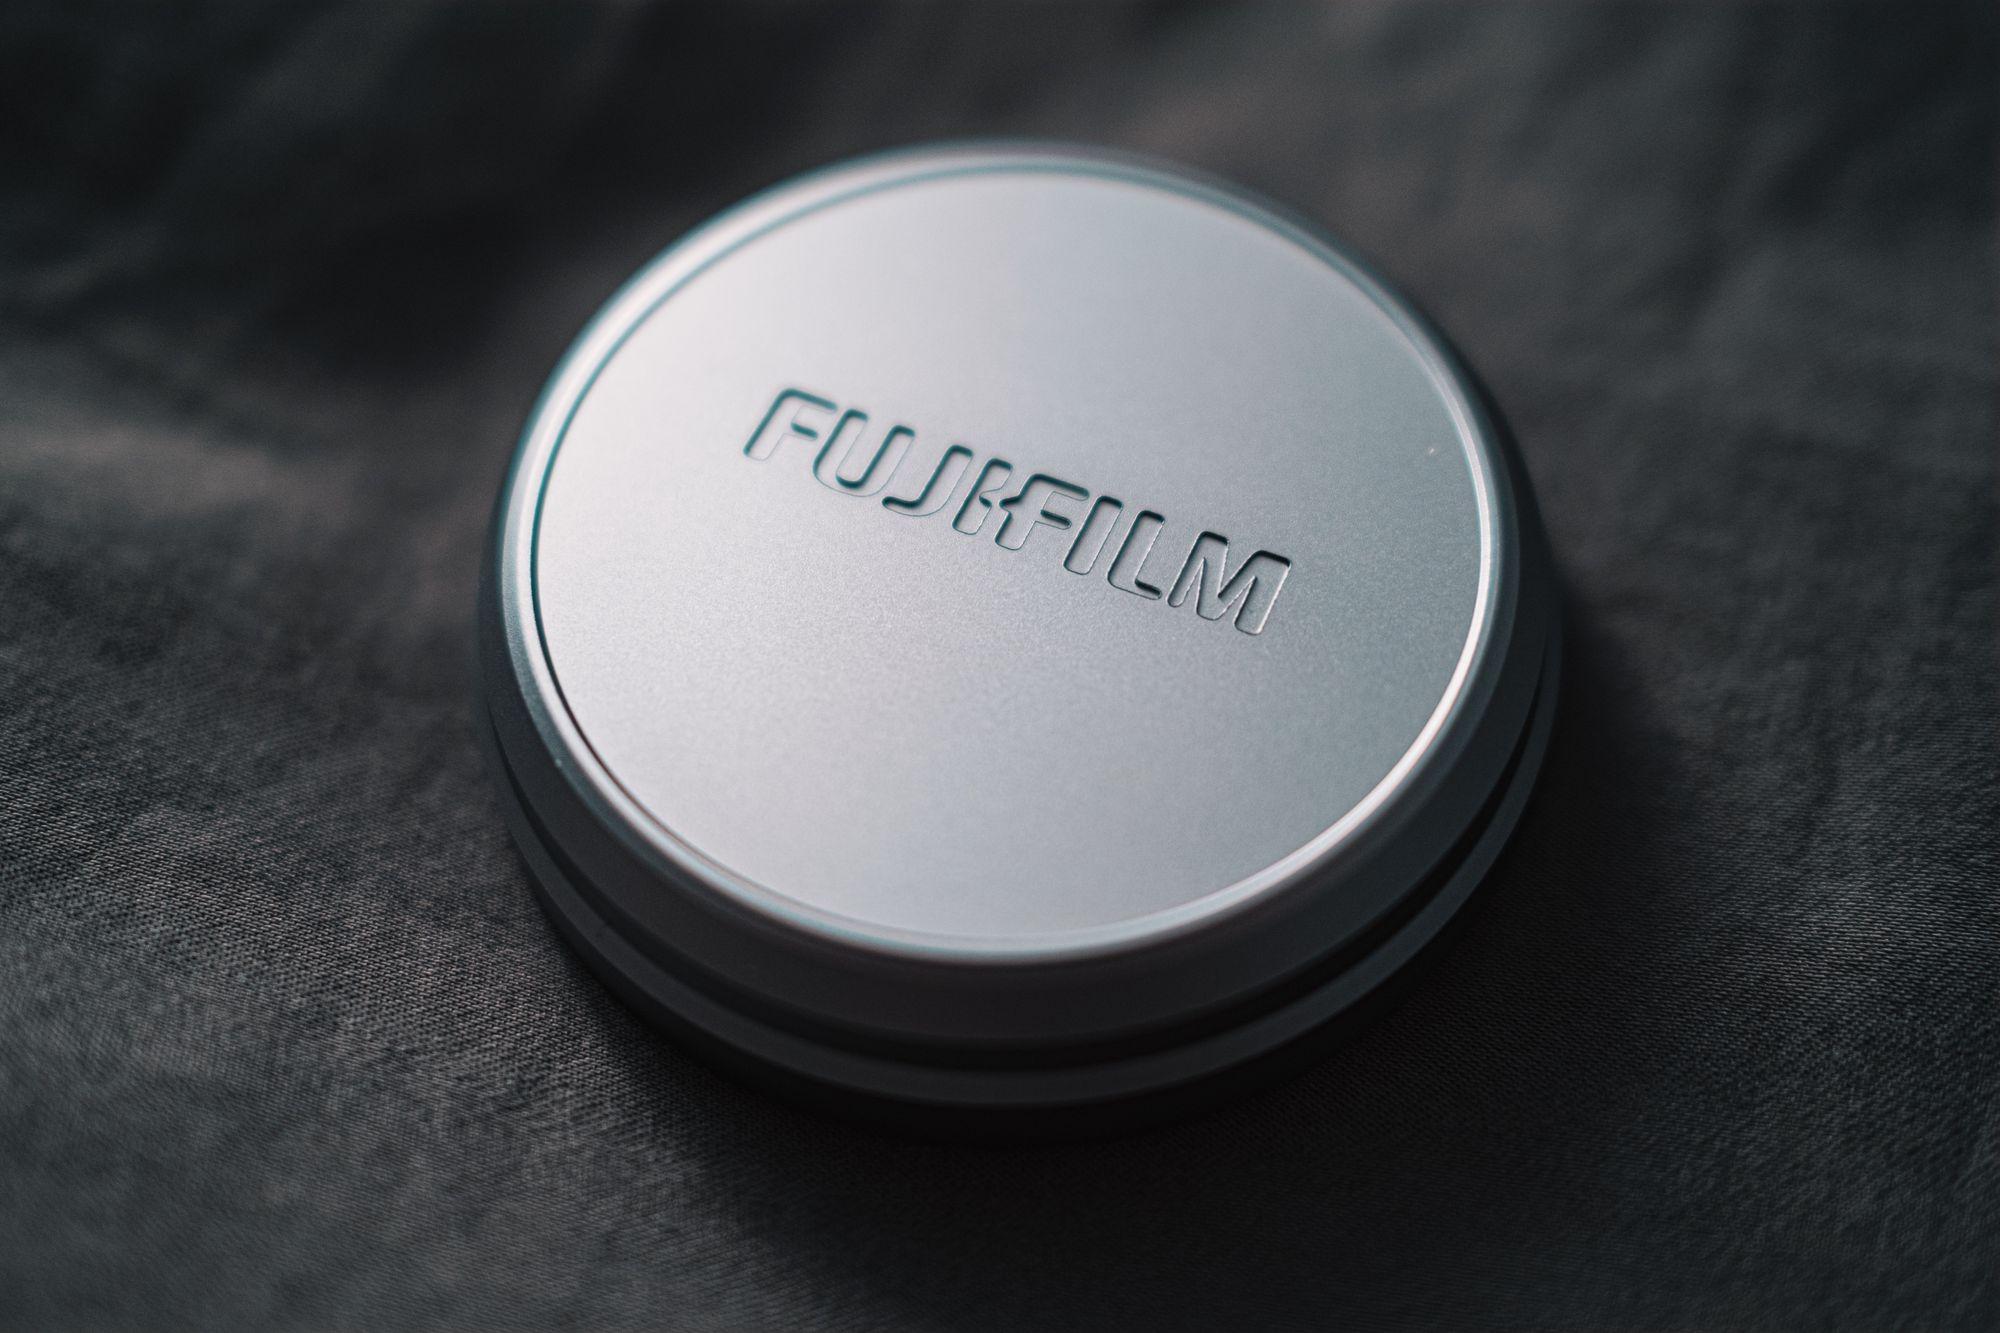 Best lens for landscape the Fujifilm XF 100-400mm